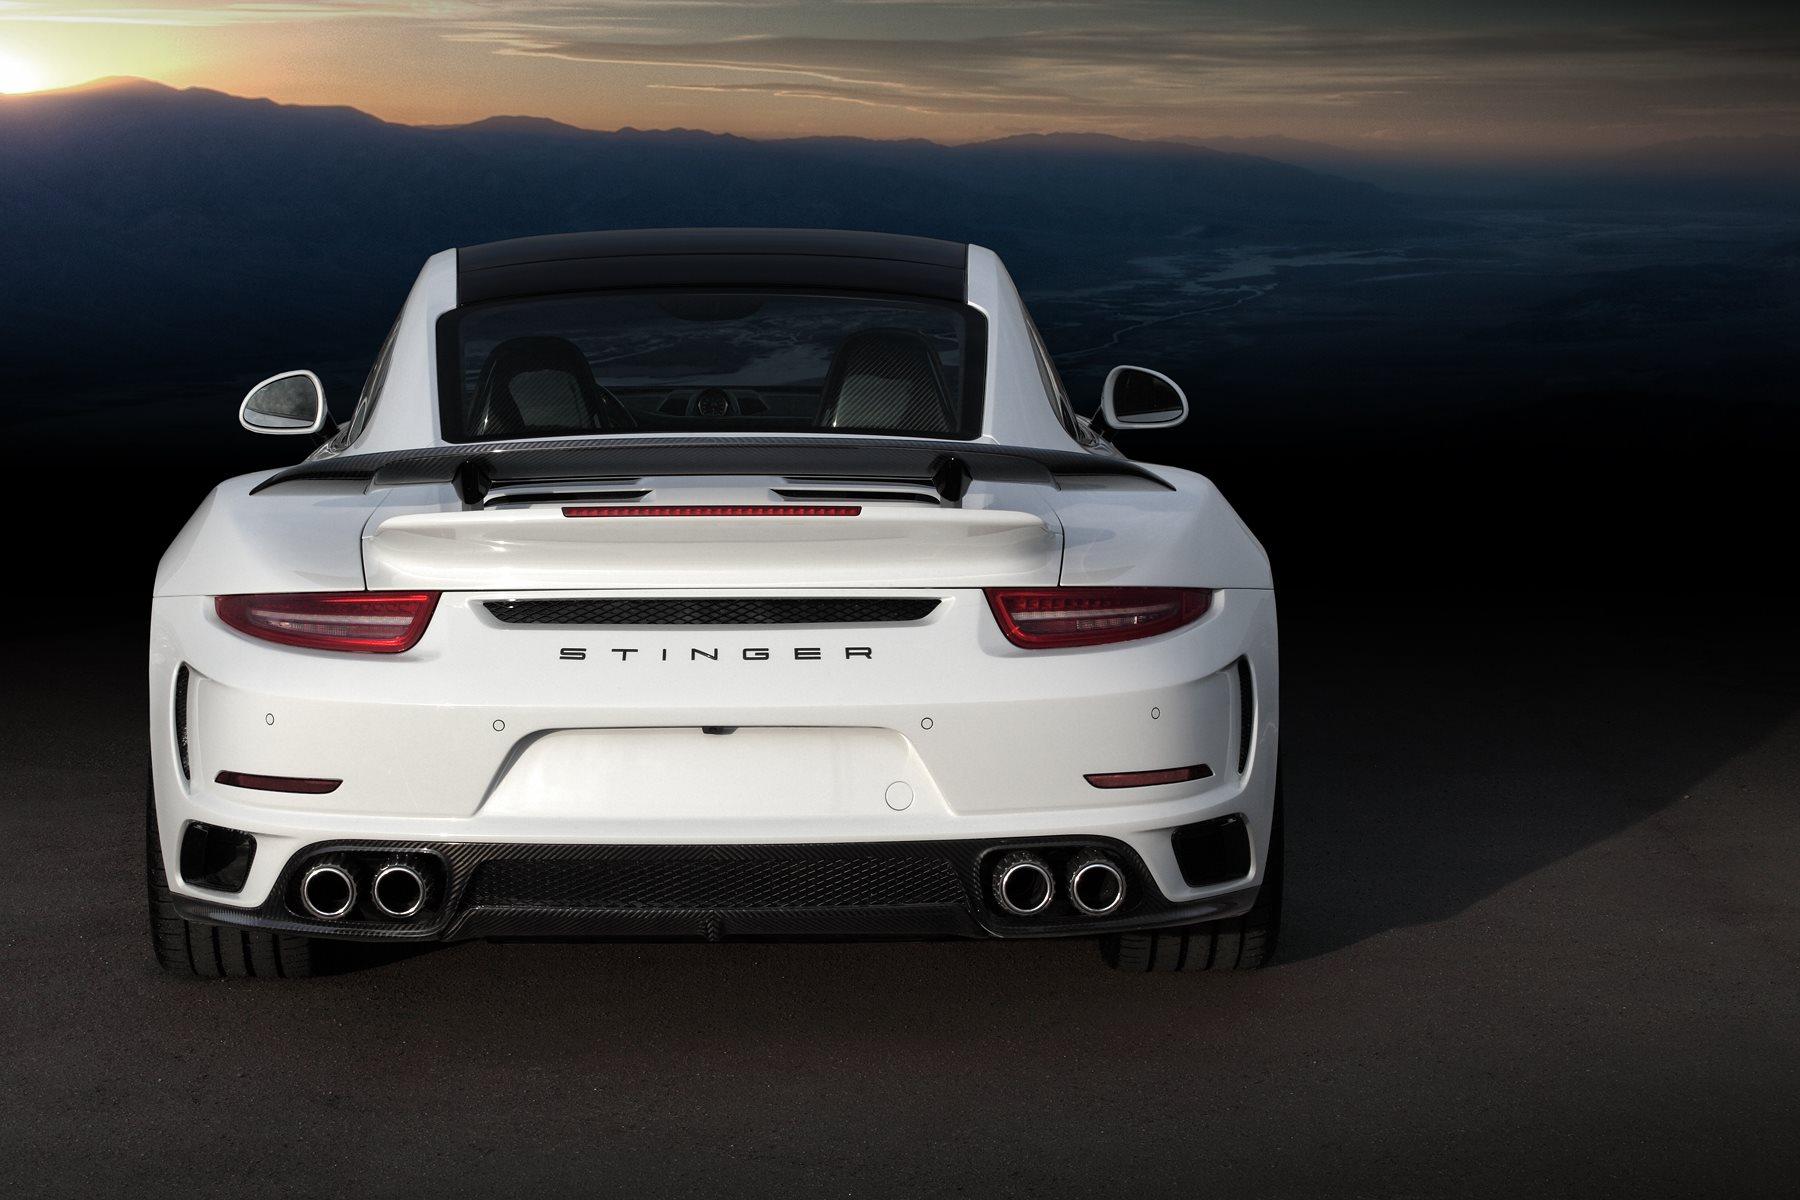 porsche 911 turbo stinger gtr by topcar has 24k gold interior autoevolution - 911 Porsche 2015 White